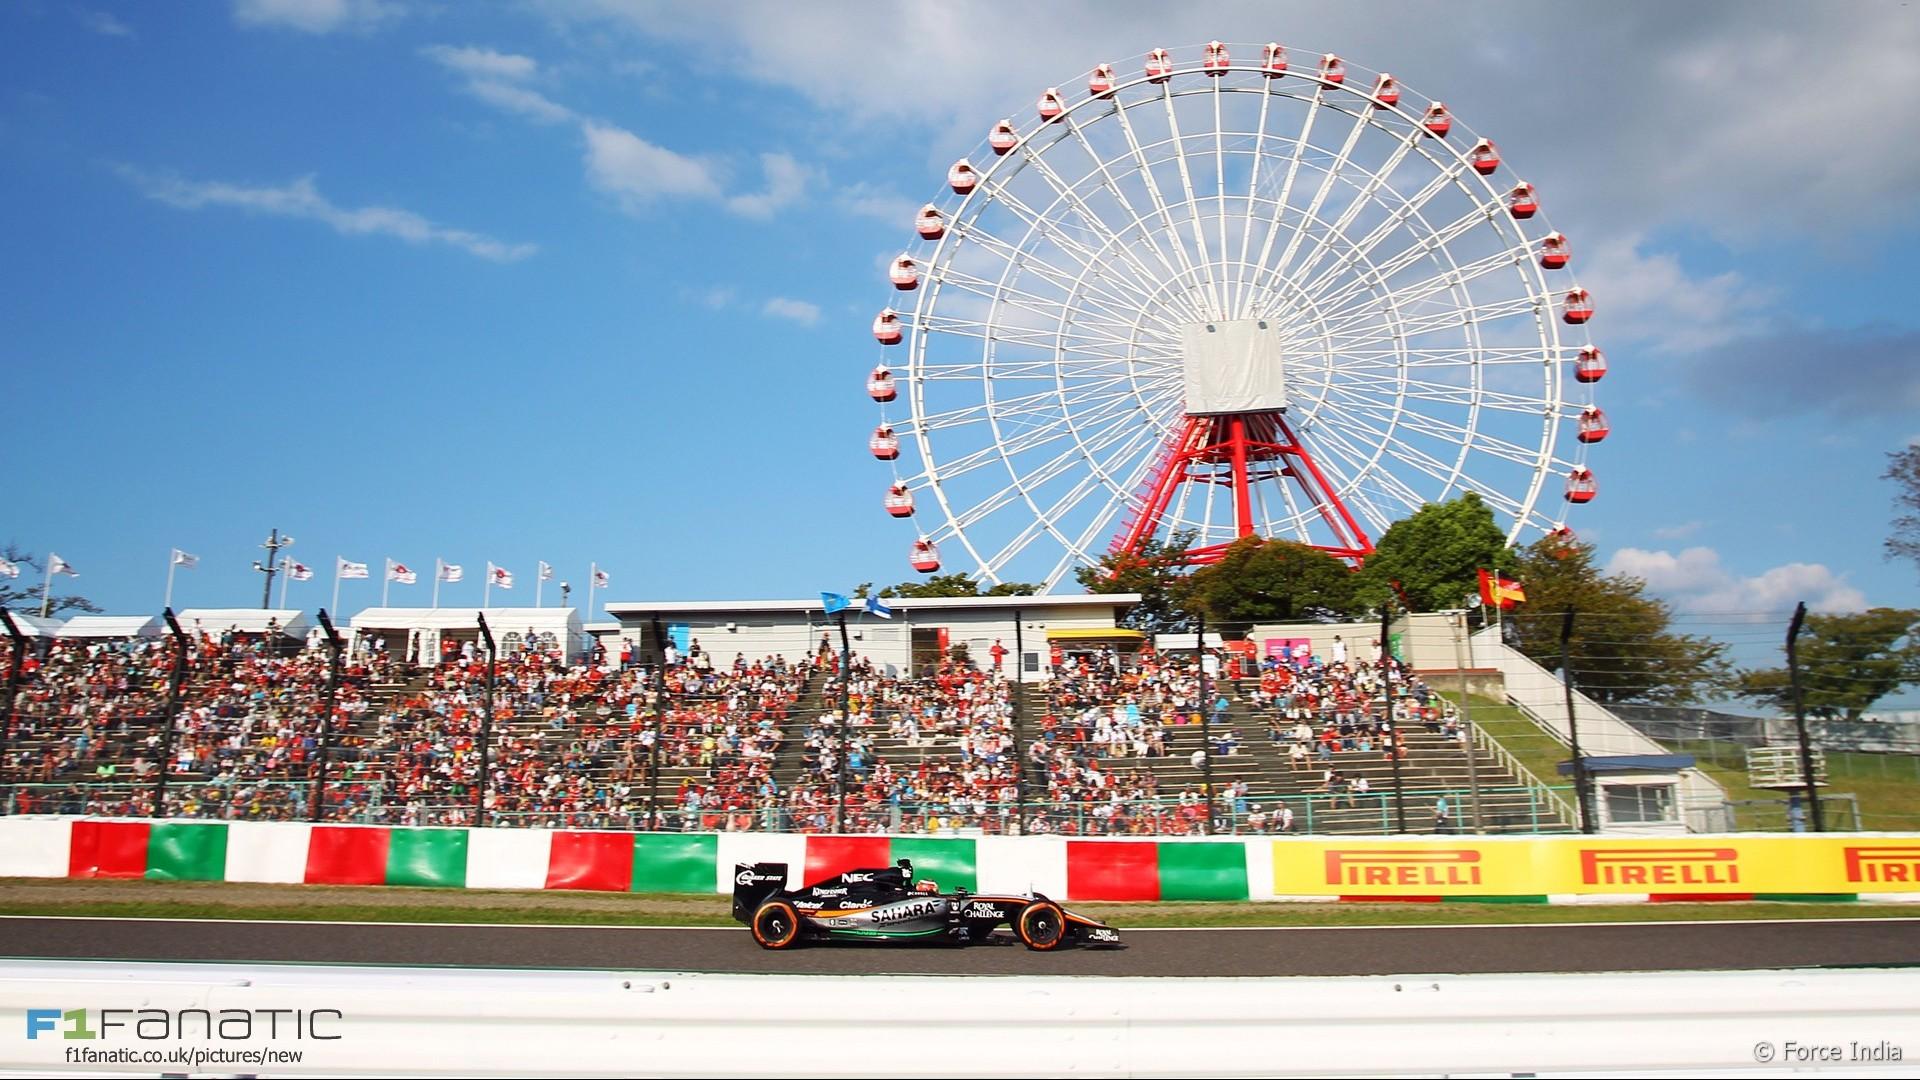 Nico Hulkenberg, Force India, Suzuka, 2015